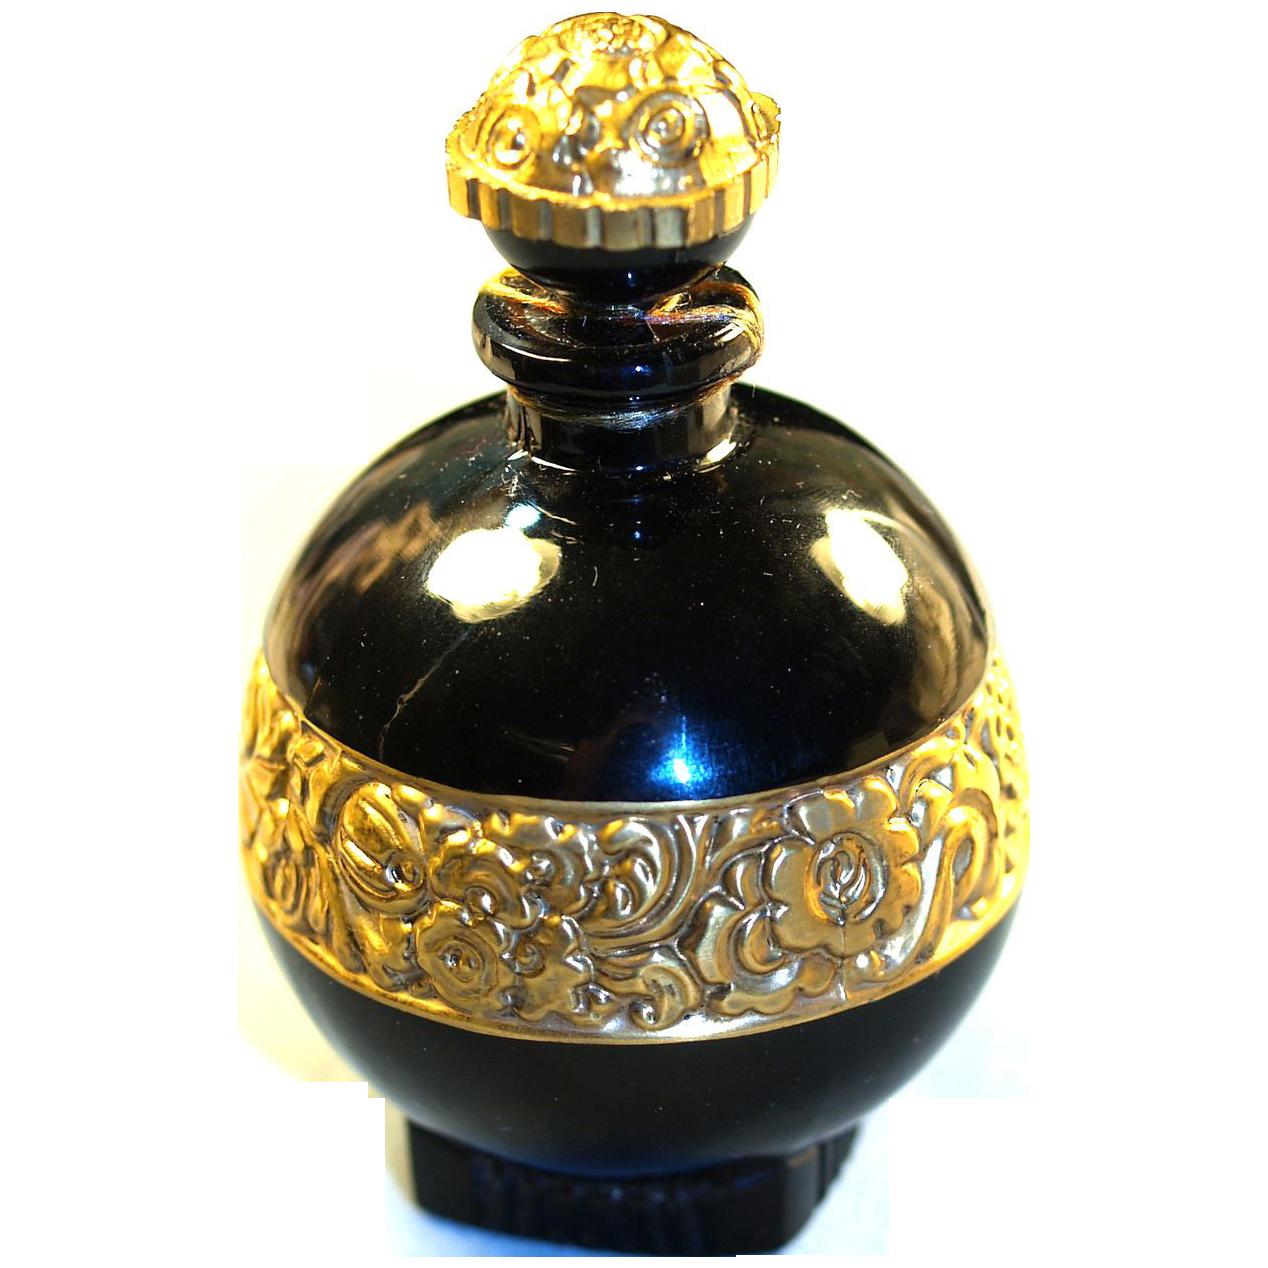 GABILLA  'Amour Americain' - Bottle by JULIEN VIARD - RARE 1920s Sealed Perfume  in Original Box